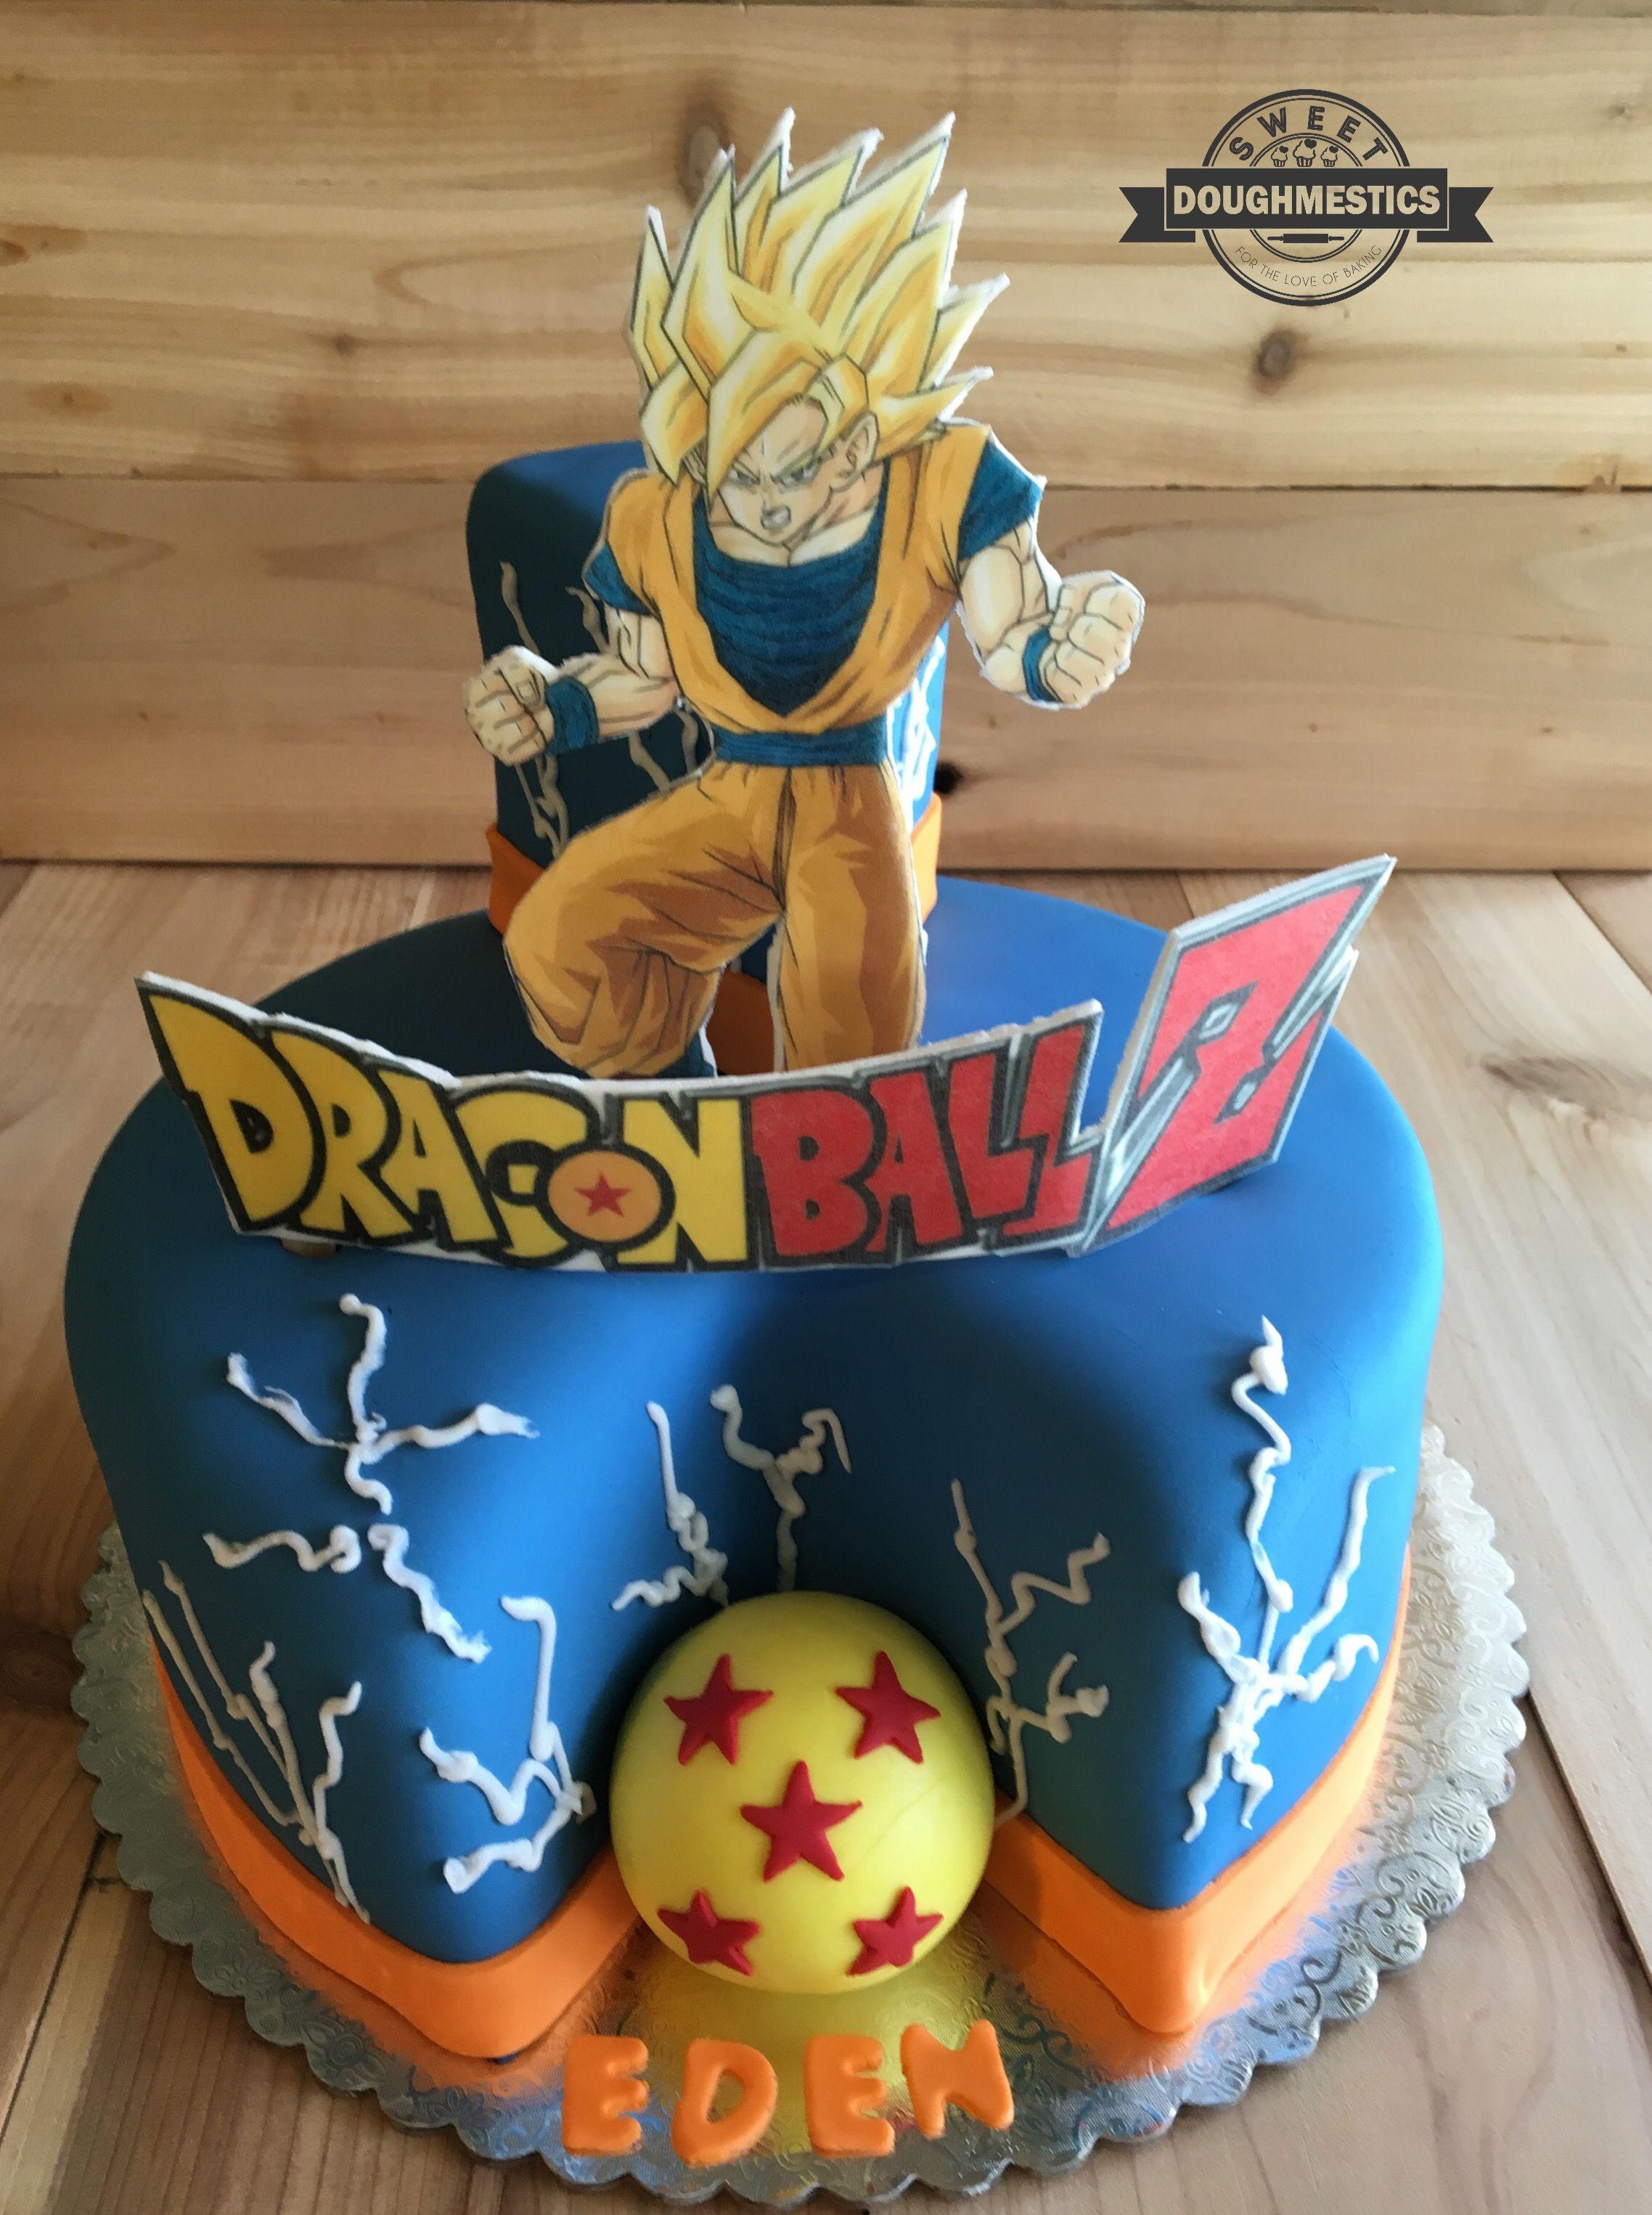 Dragon Ball Z Cake By Sweet Doughmestics Sweet